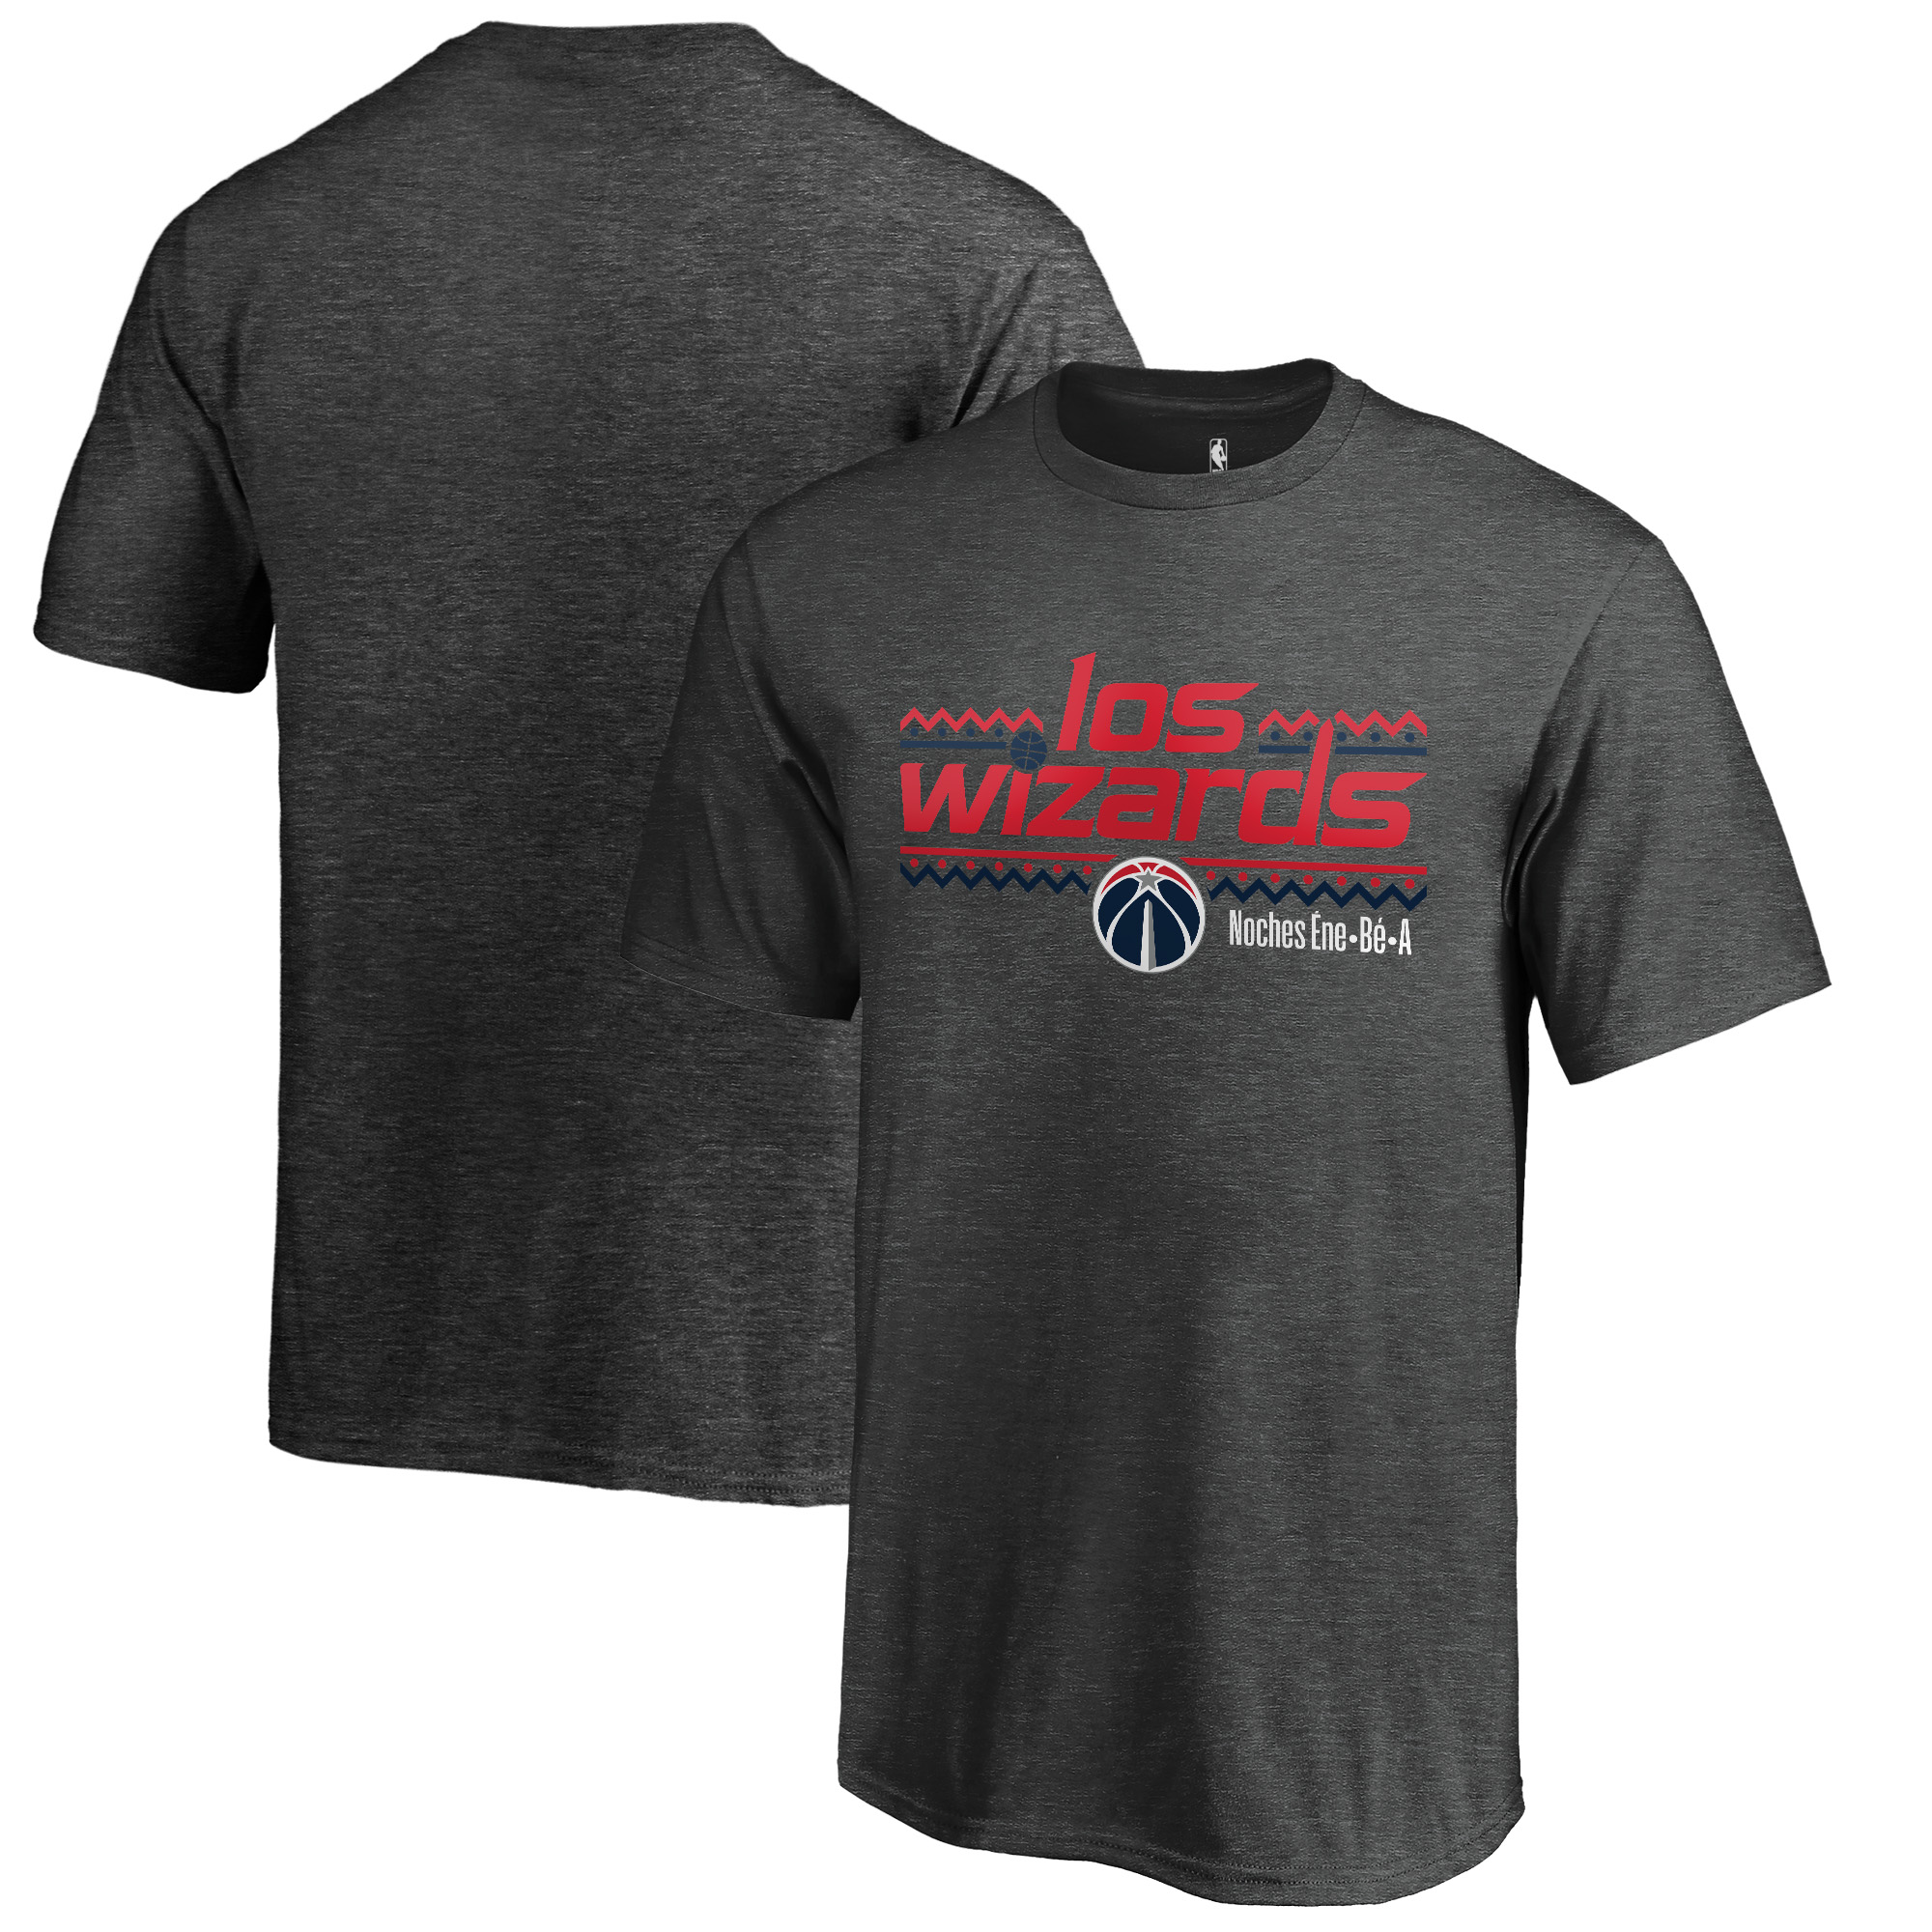 Washington Wizards Fanatics Branded Youth Noches Ene-Be-A T-Shirt - Heather Gray